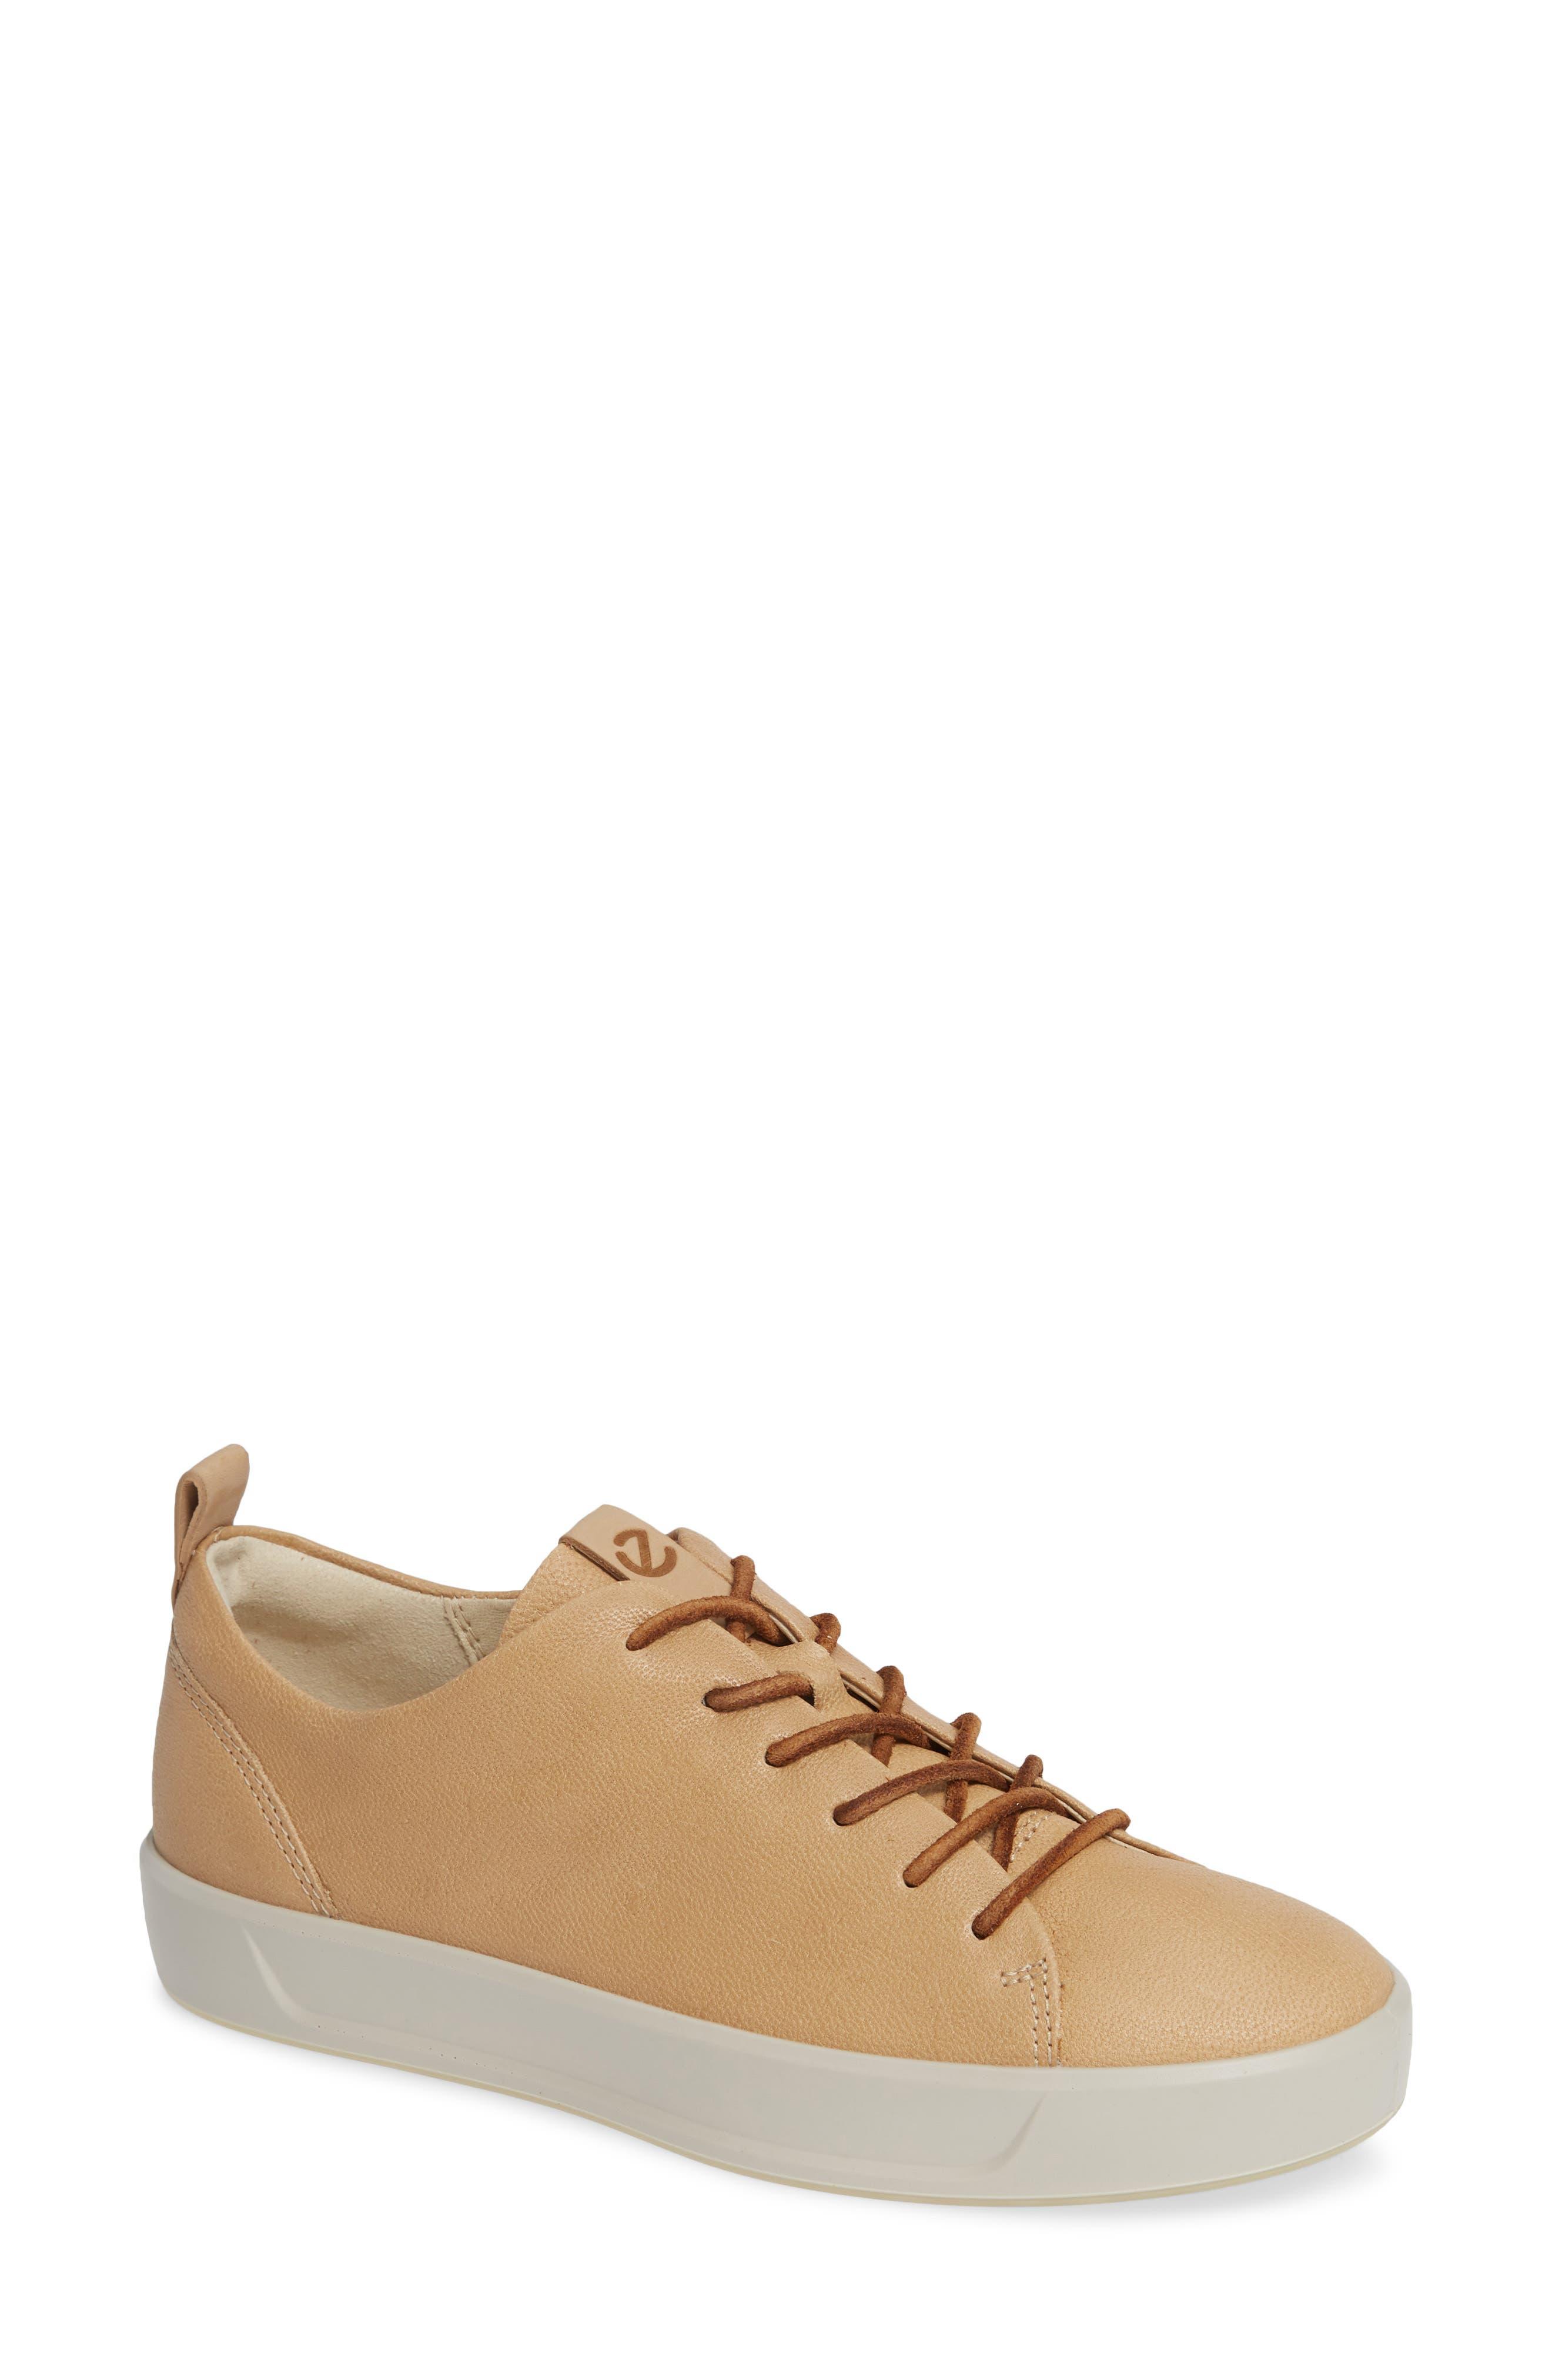 ECCO, Soft 8 Sneaker, Main thumbnail 1, color, POWDER LEATHER